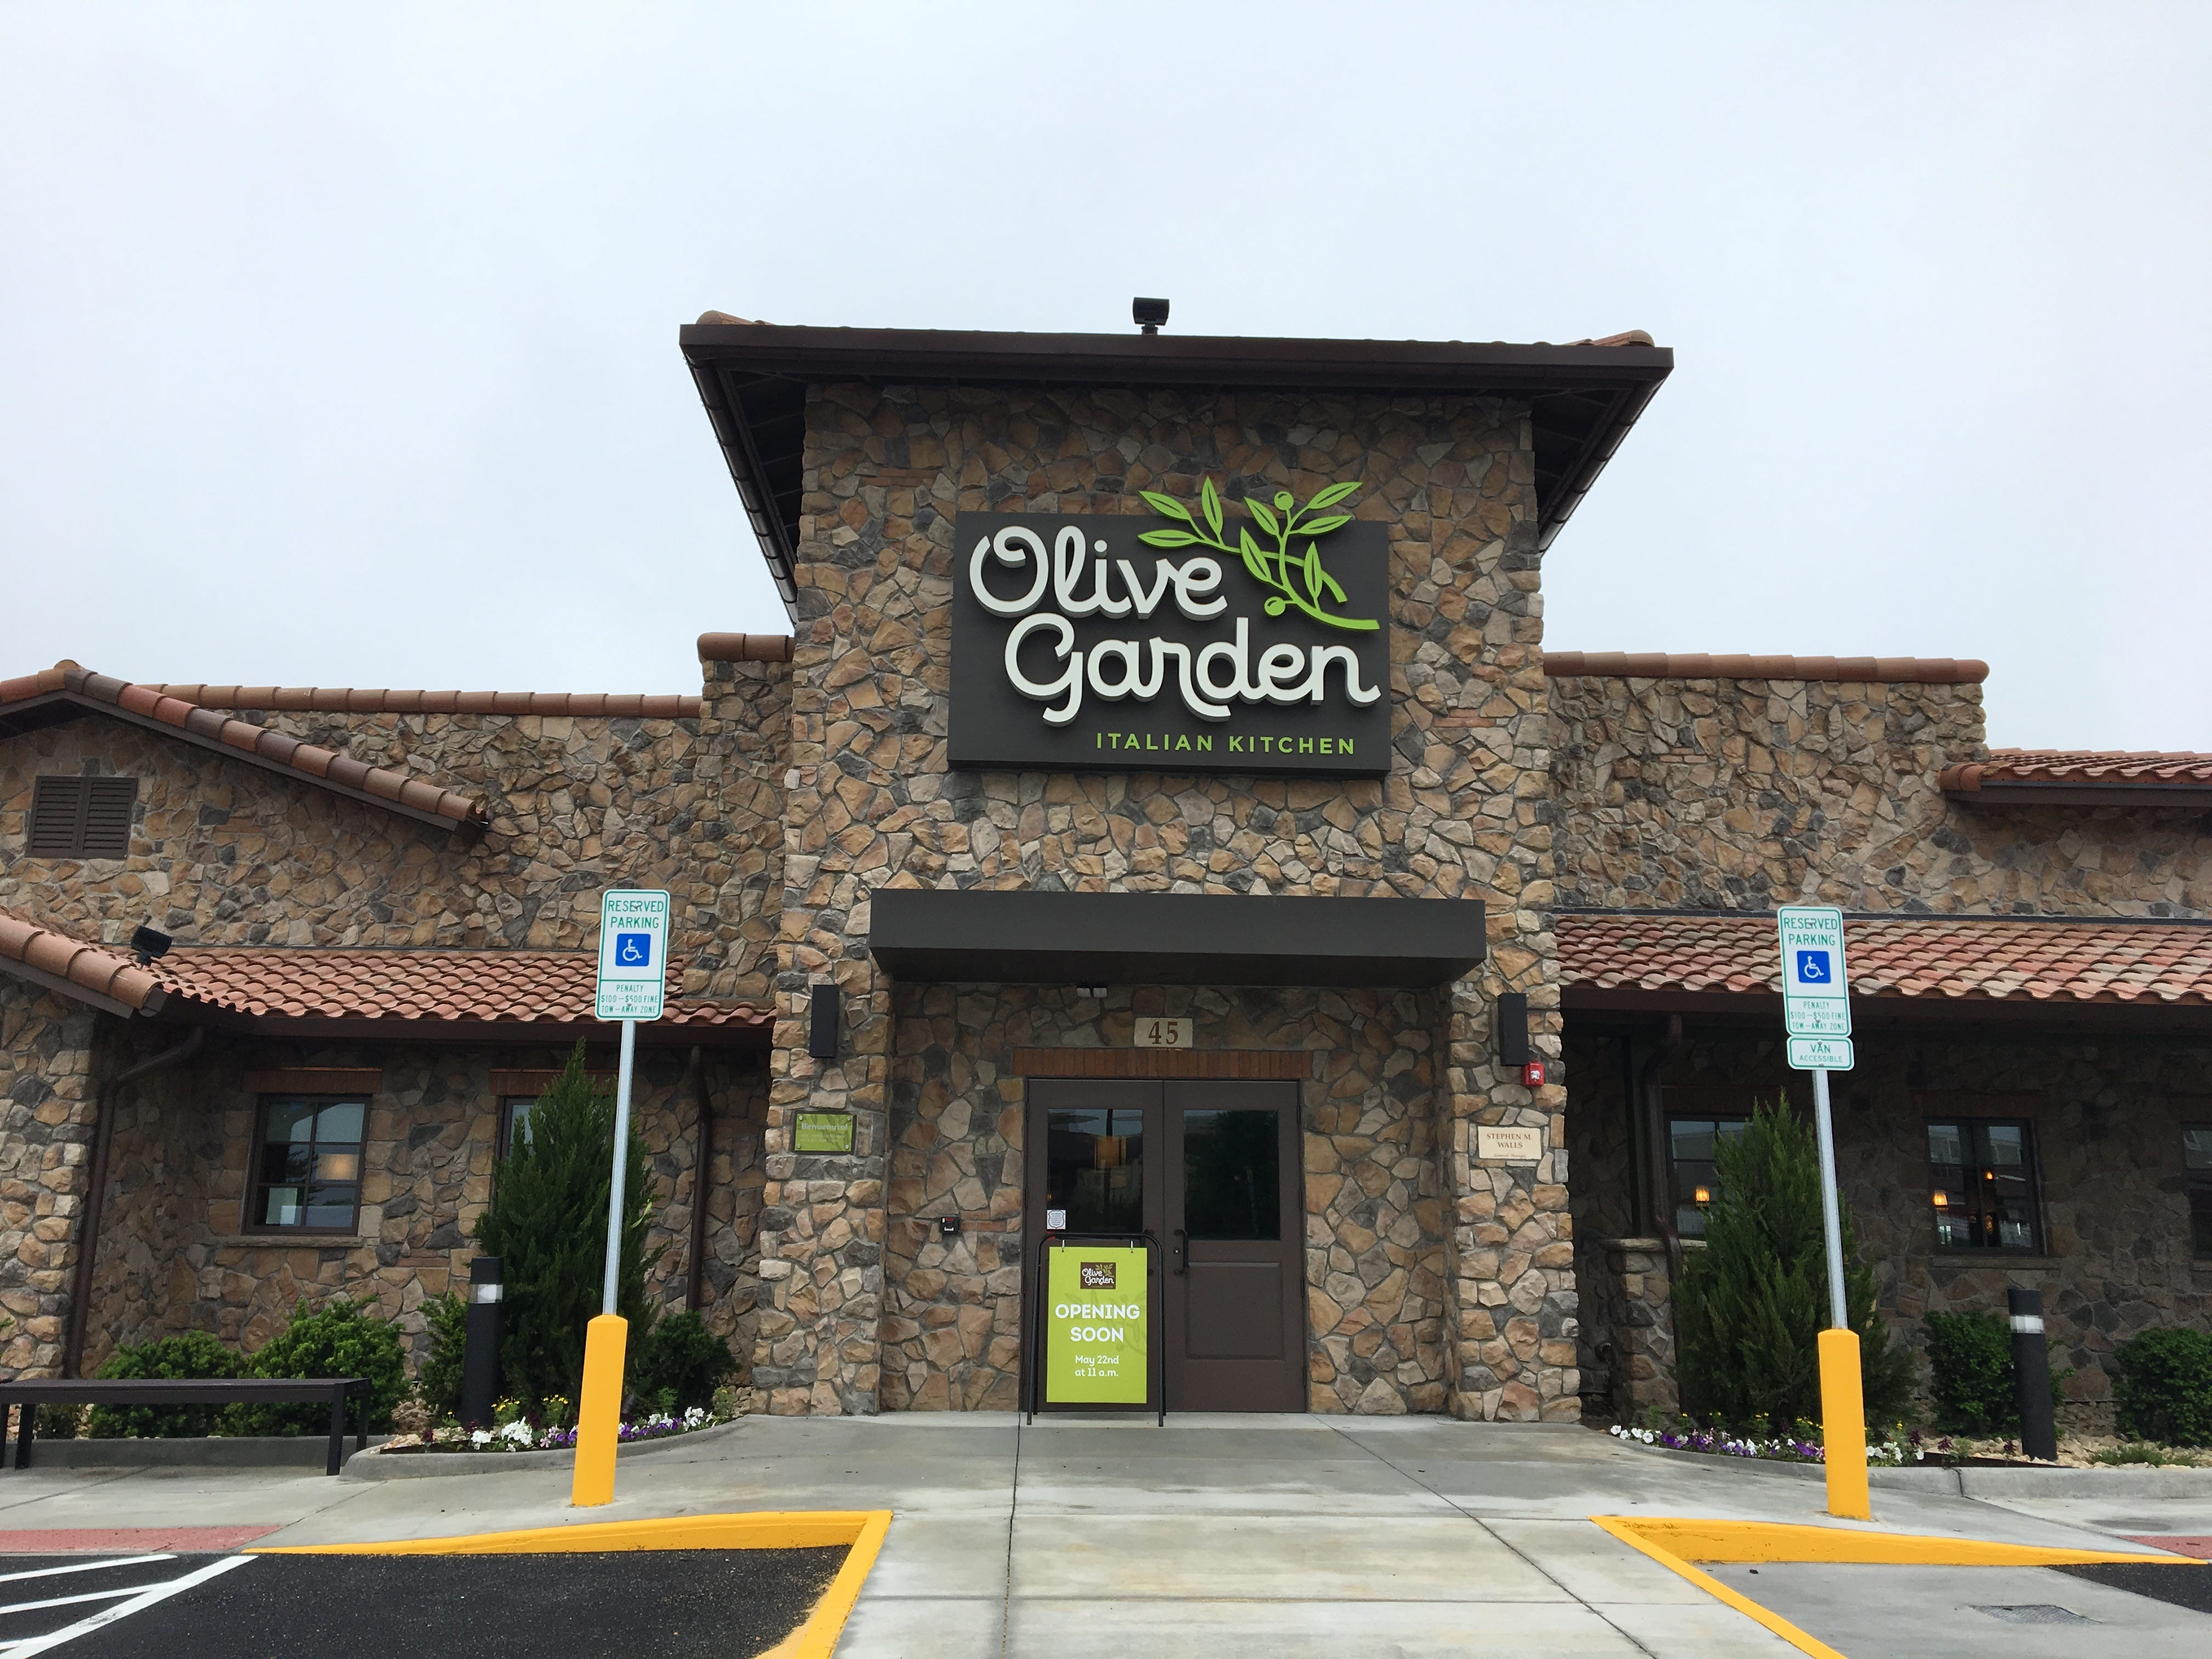 Olive Garden in Waynesboro is a hoax